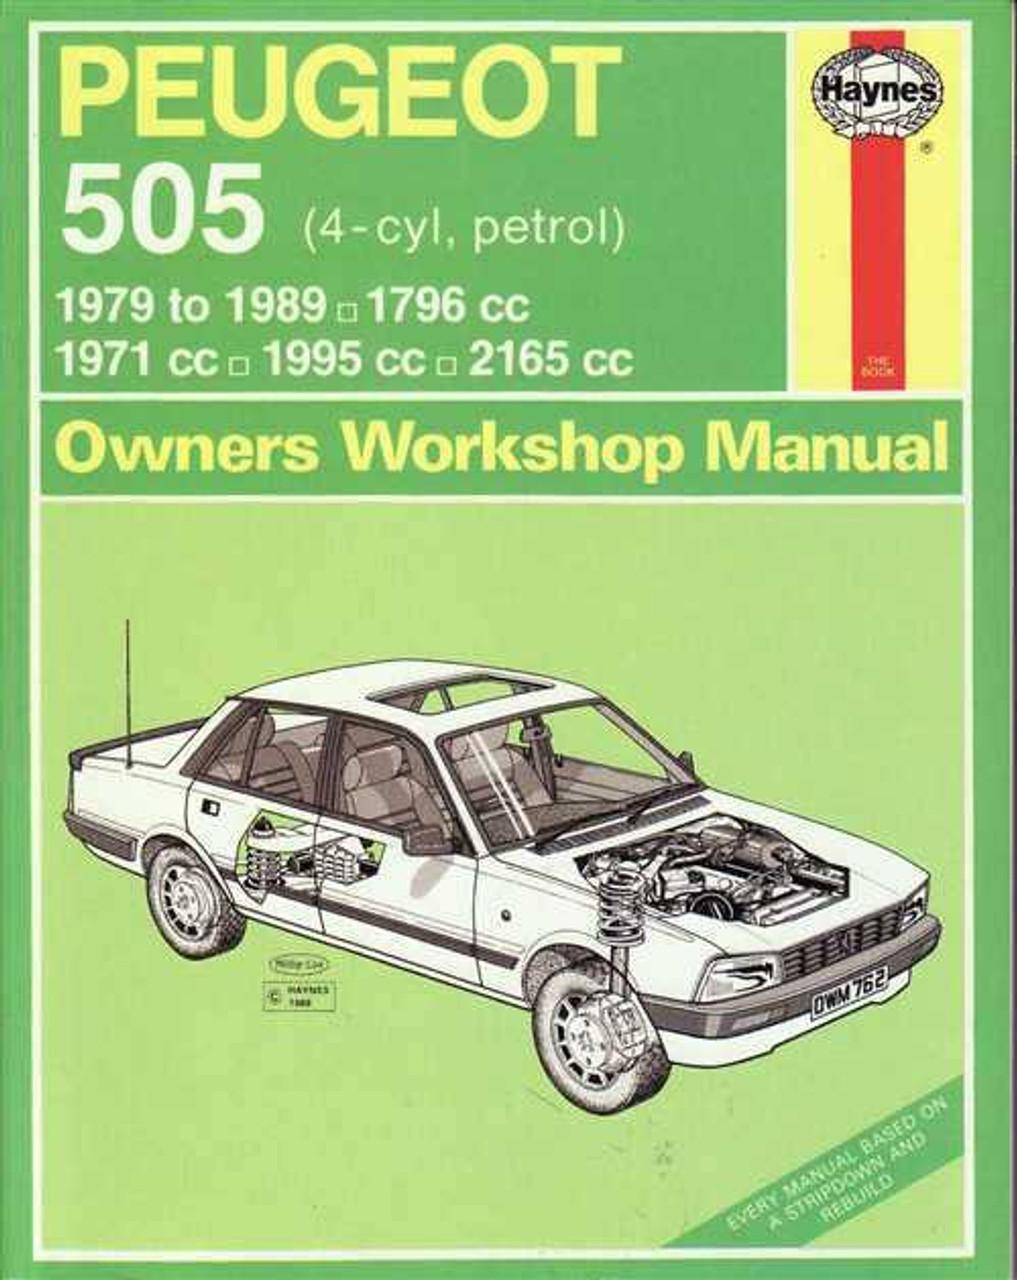 peugeot 505 1971 1995 workshop manual rh automotobookshop com au peugeot 505 workshop manual pdf peugeot 505 workshop manual pdf